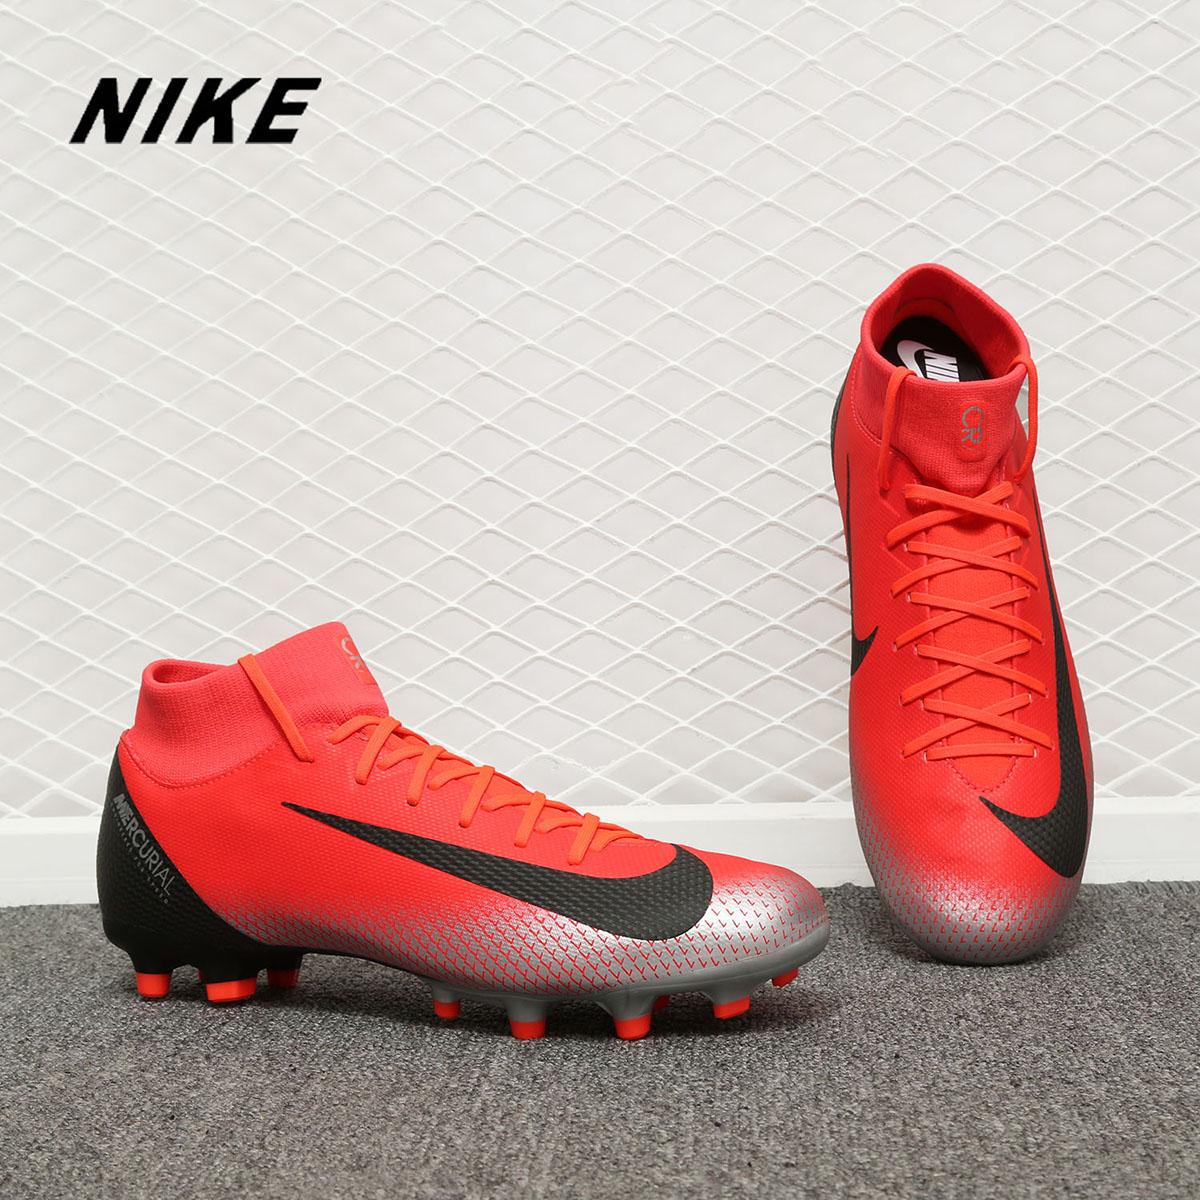 Nike/耐克正品 SUPERFLY 6 ACADEMY FG/MG 男子运动足球鞋AJ3541